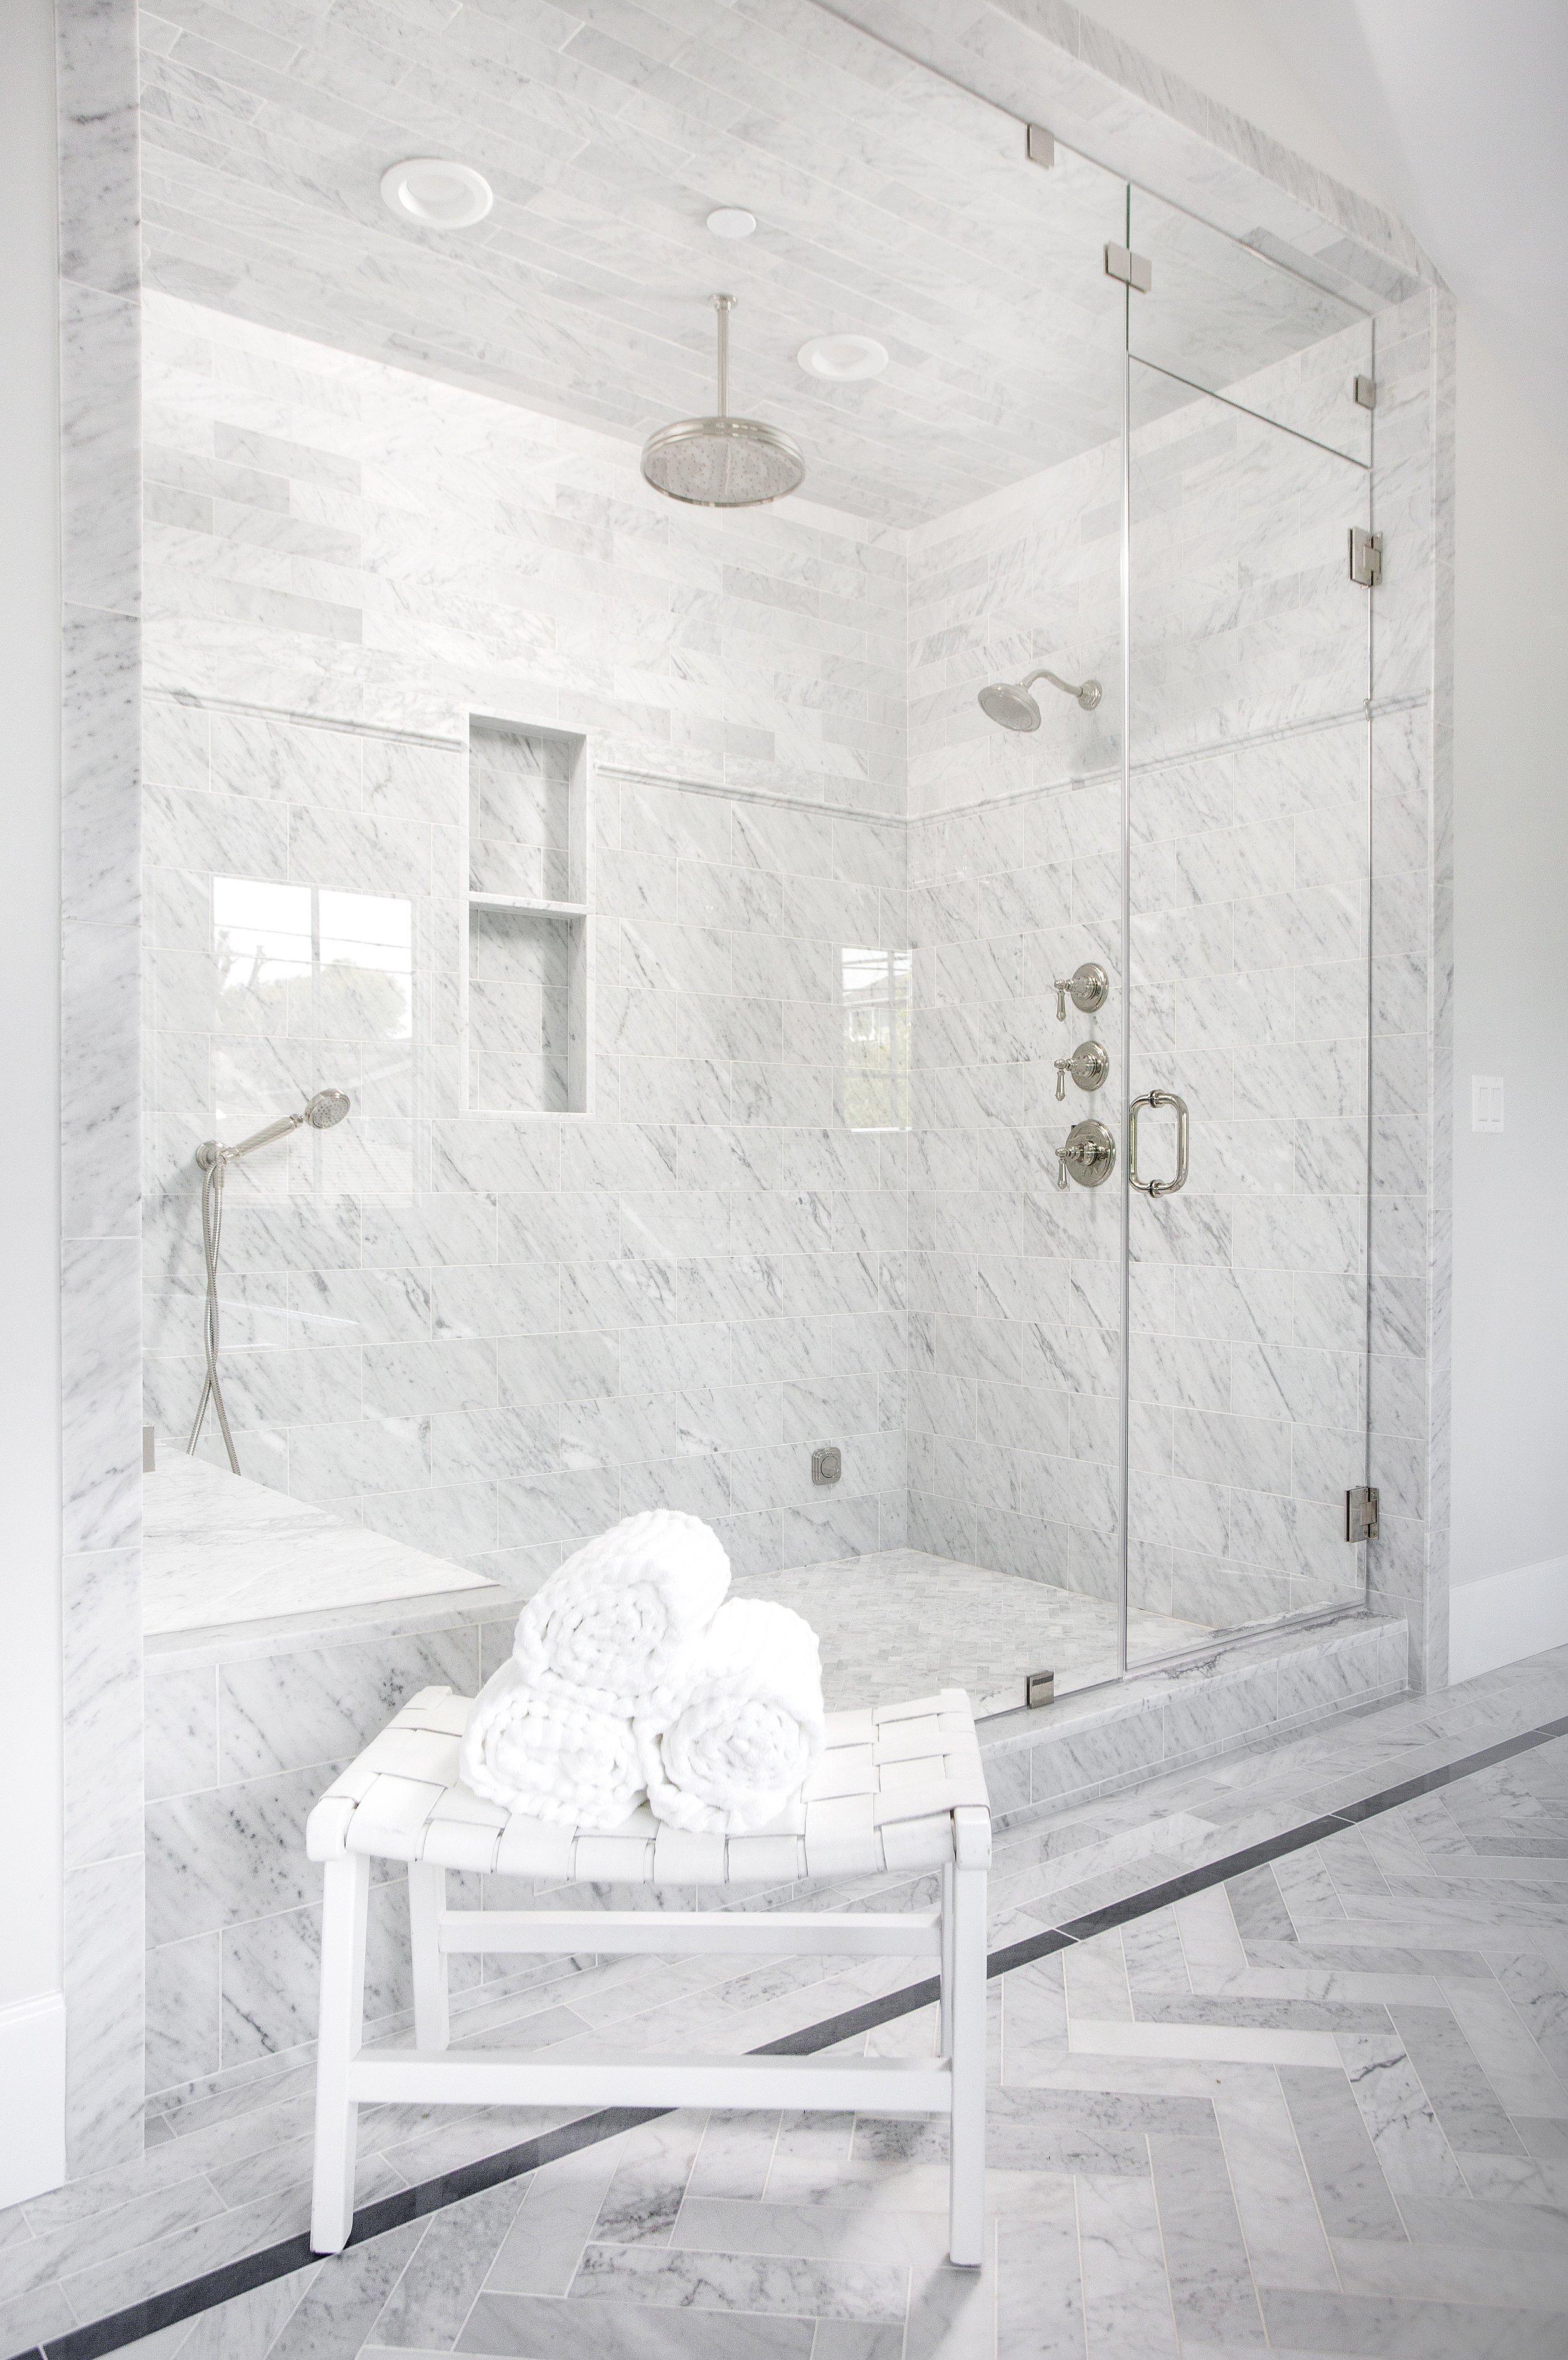 21ST_HEDRICK_06.jpg shower.jpg